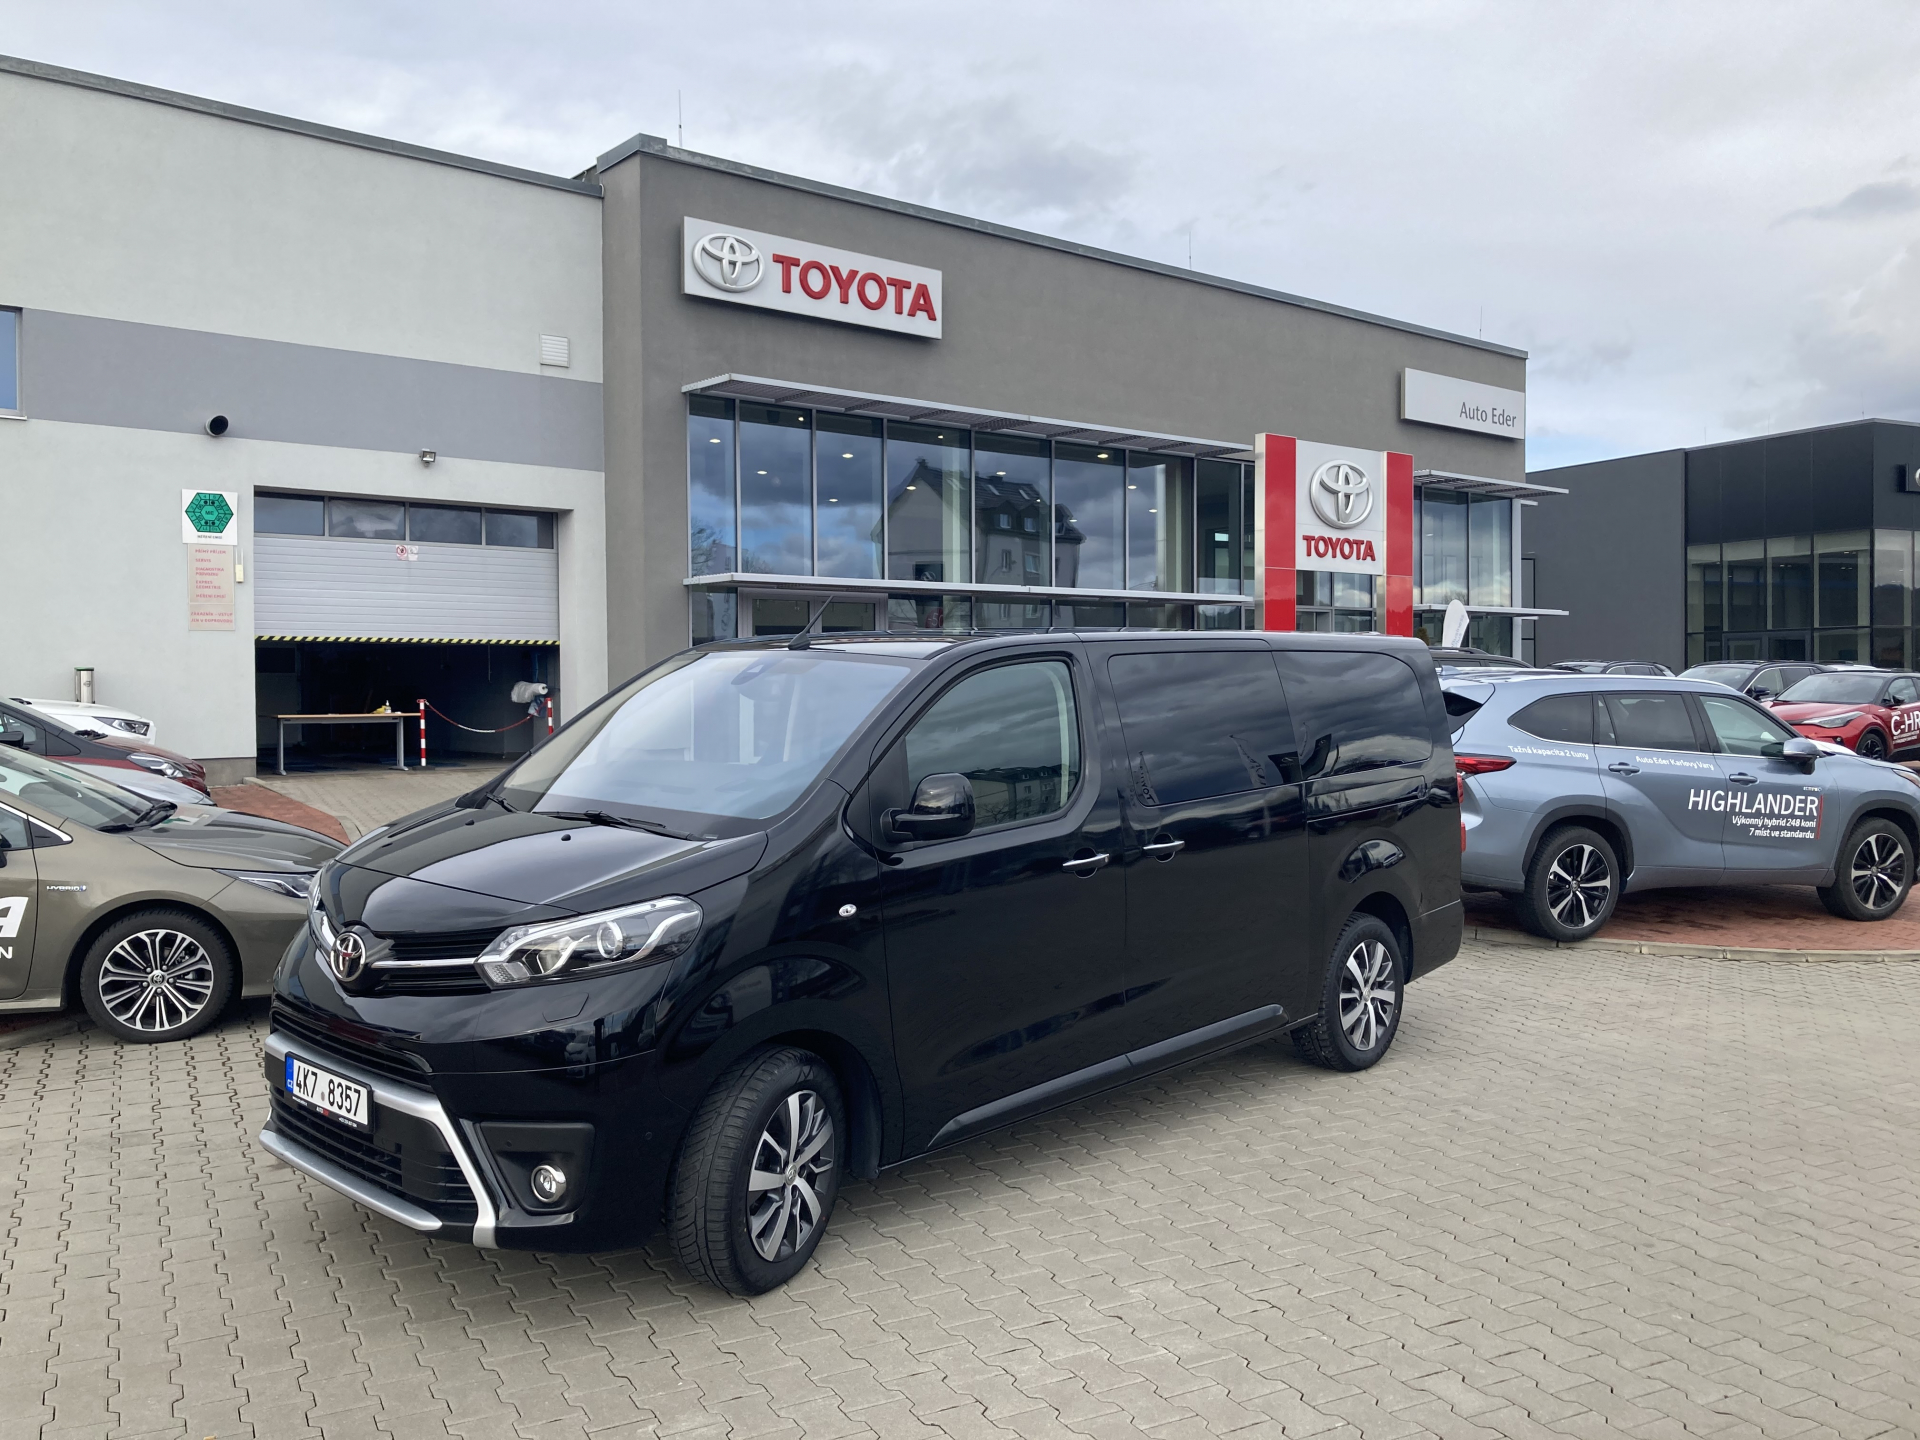 Toyota PROACE VERSO VIP L2 2,0 D-4D (180 k) diesel 8st. aut. převodovka